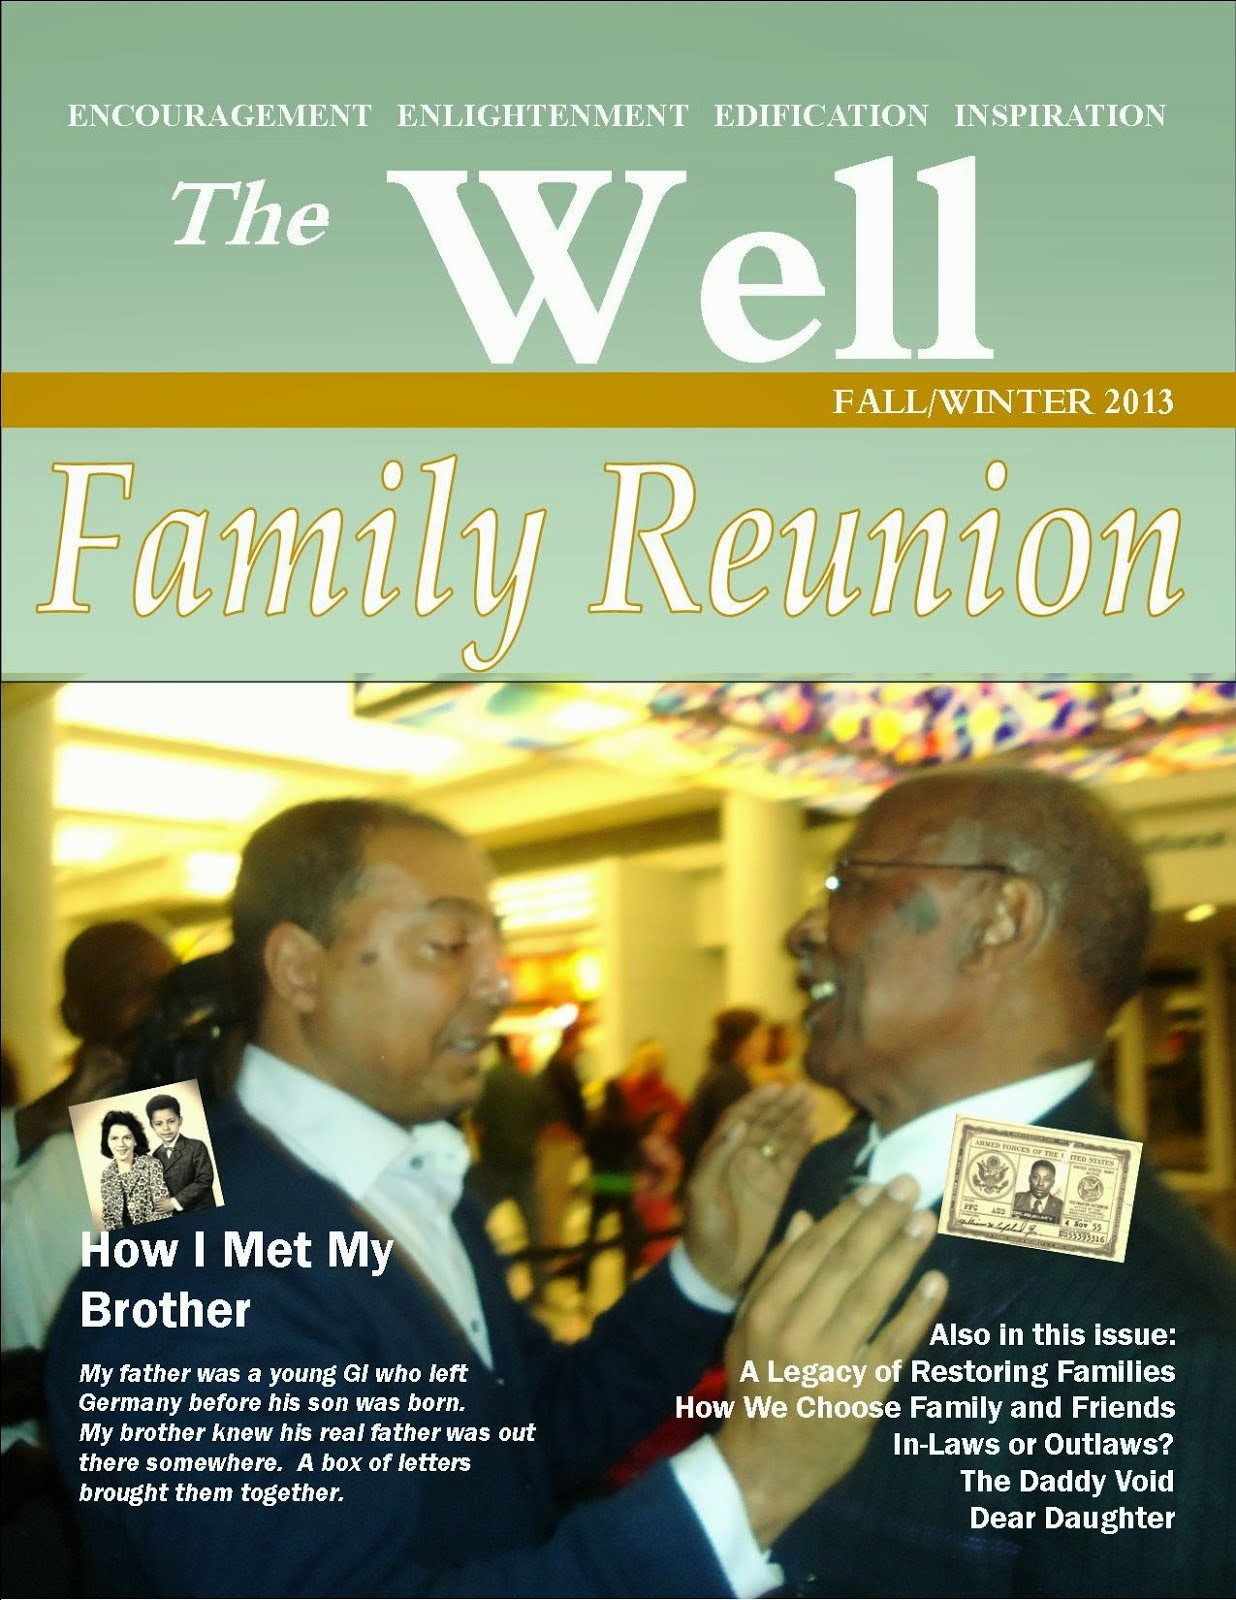 The Well Magazine Fall/Winter 2013